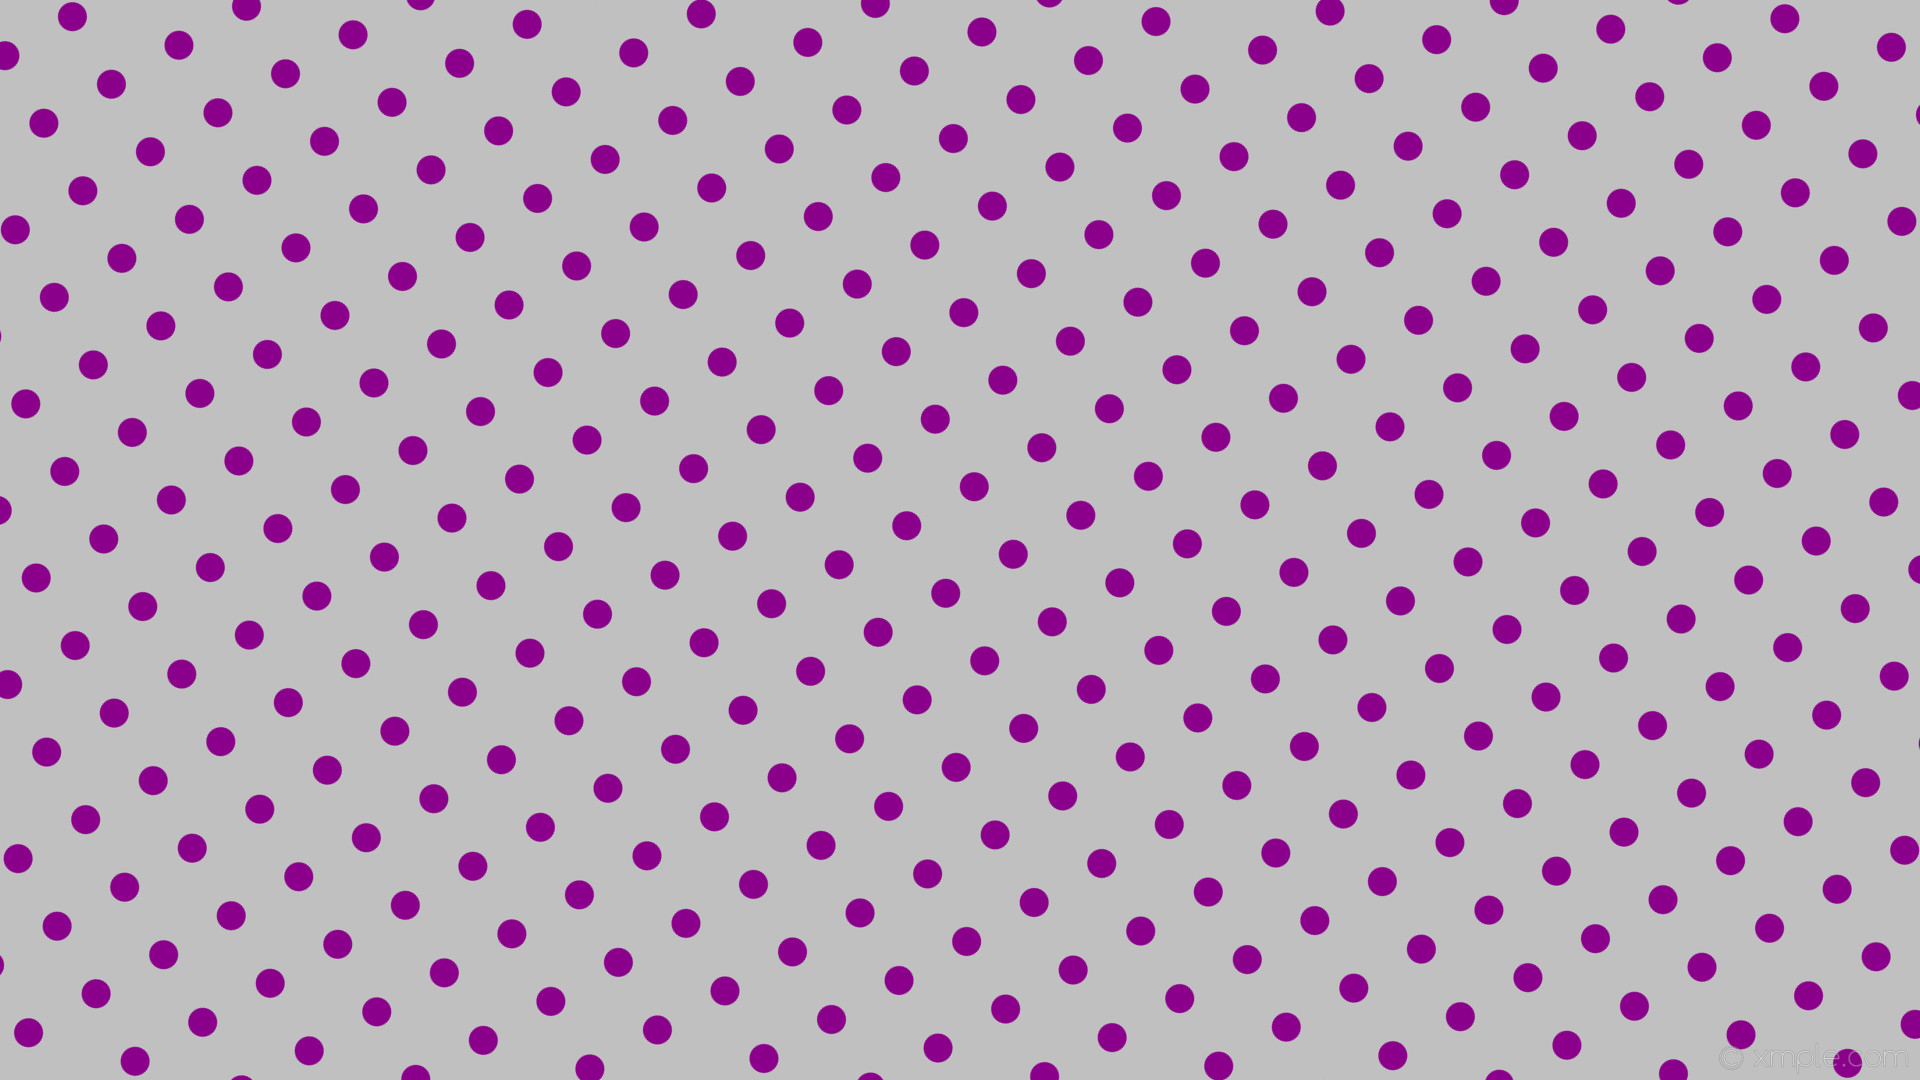 wallpaper polka spots dots purple grey silver dark magenta #c0c0c0 #8b008b  210° 29px